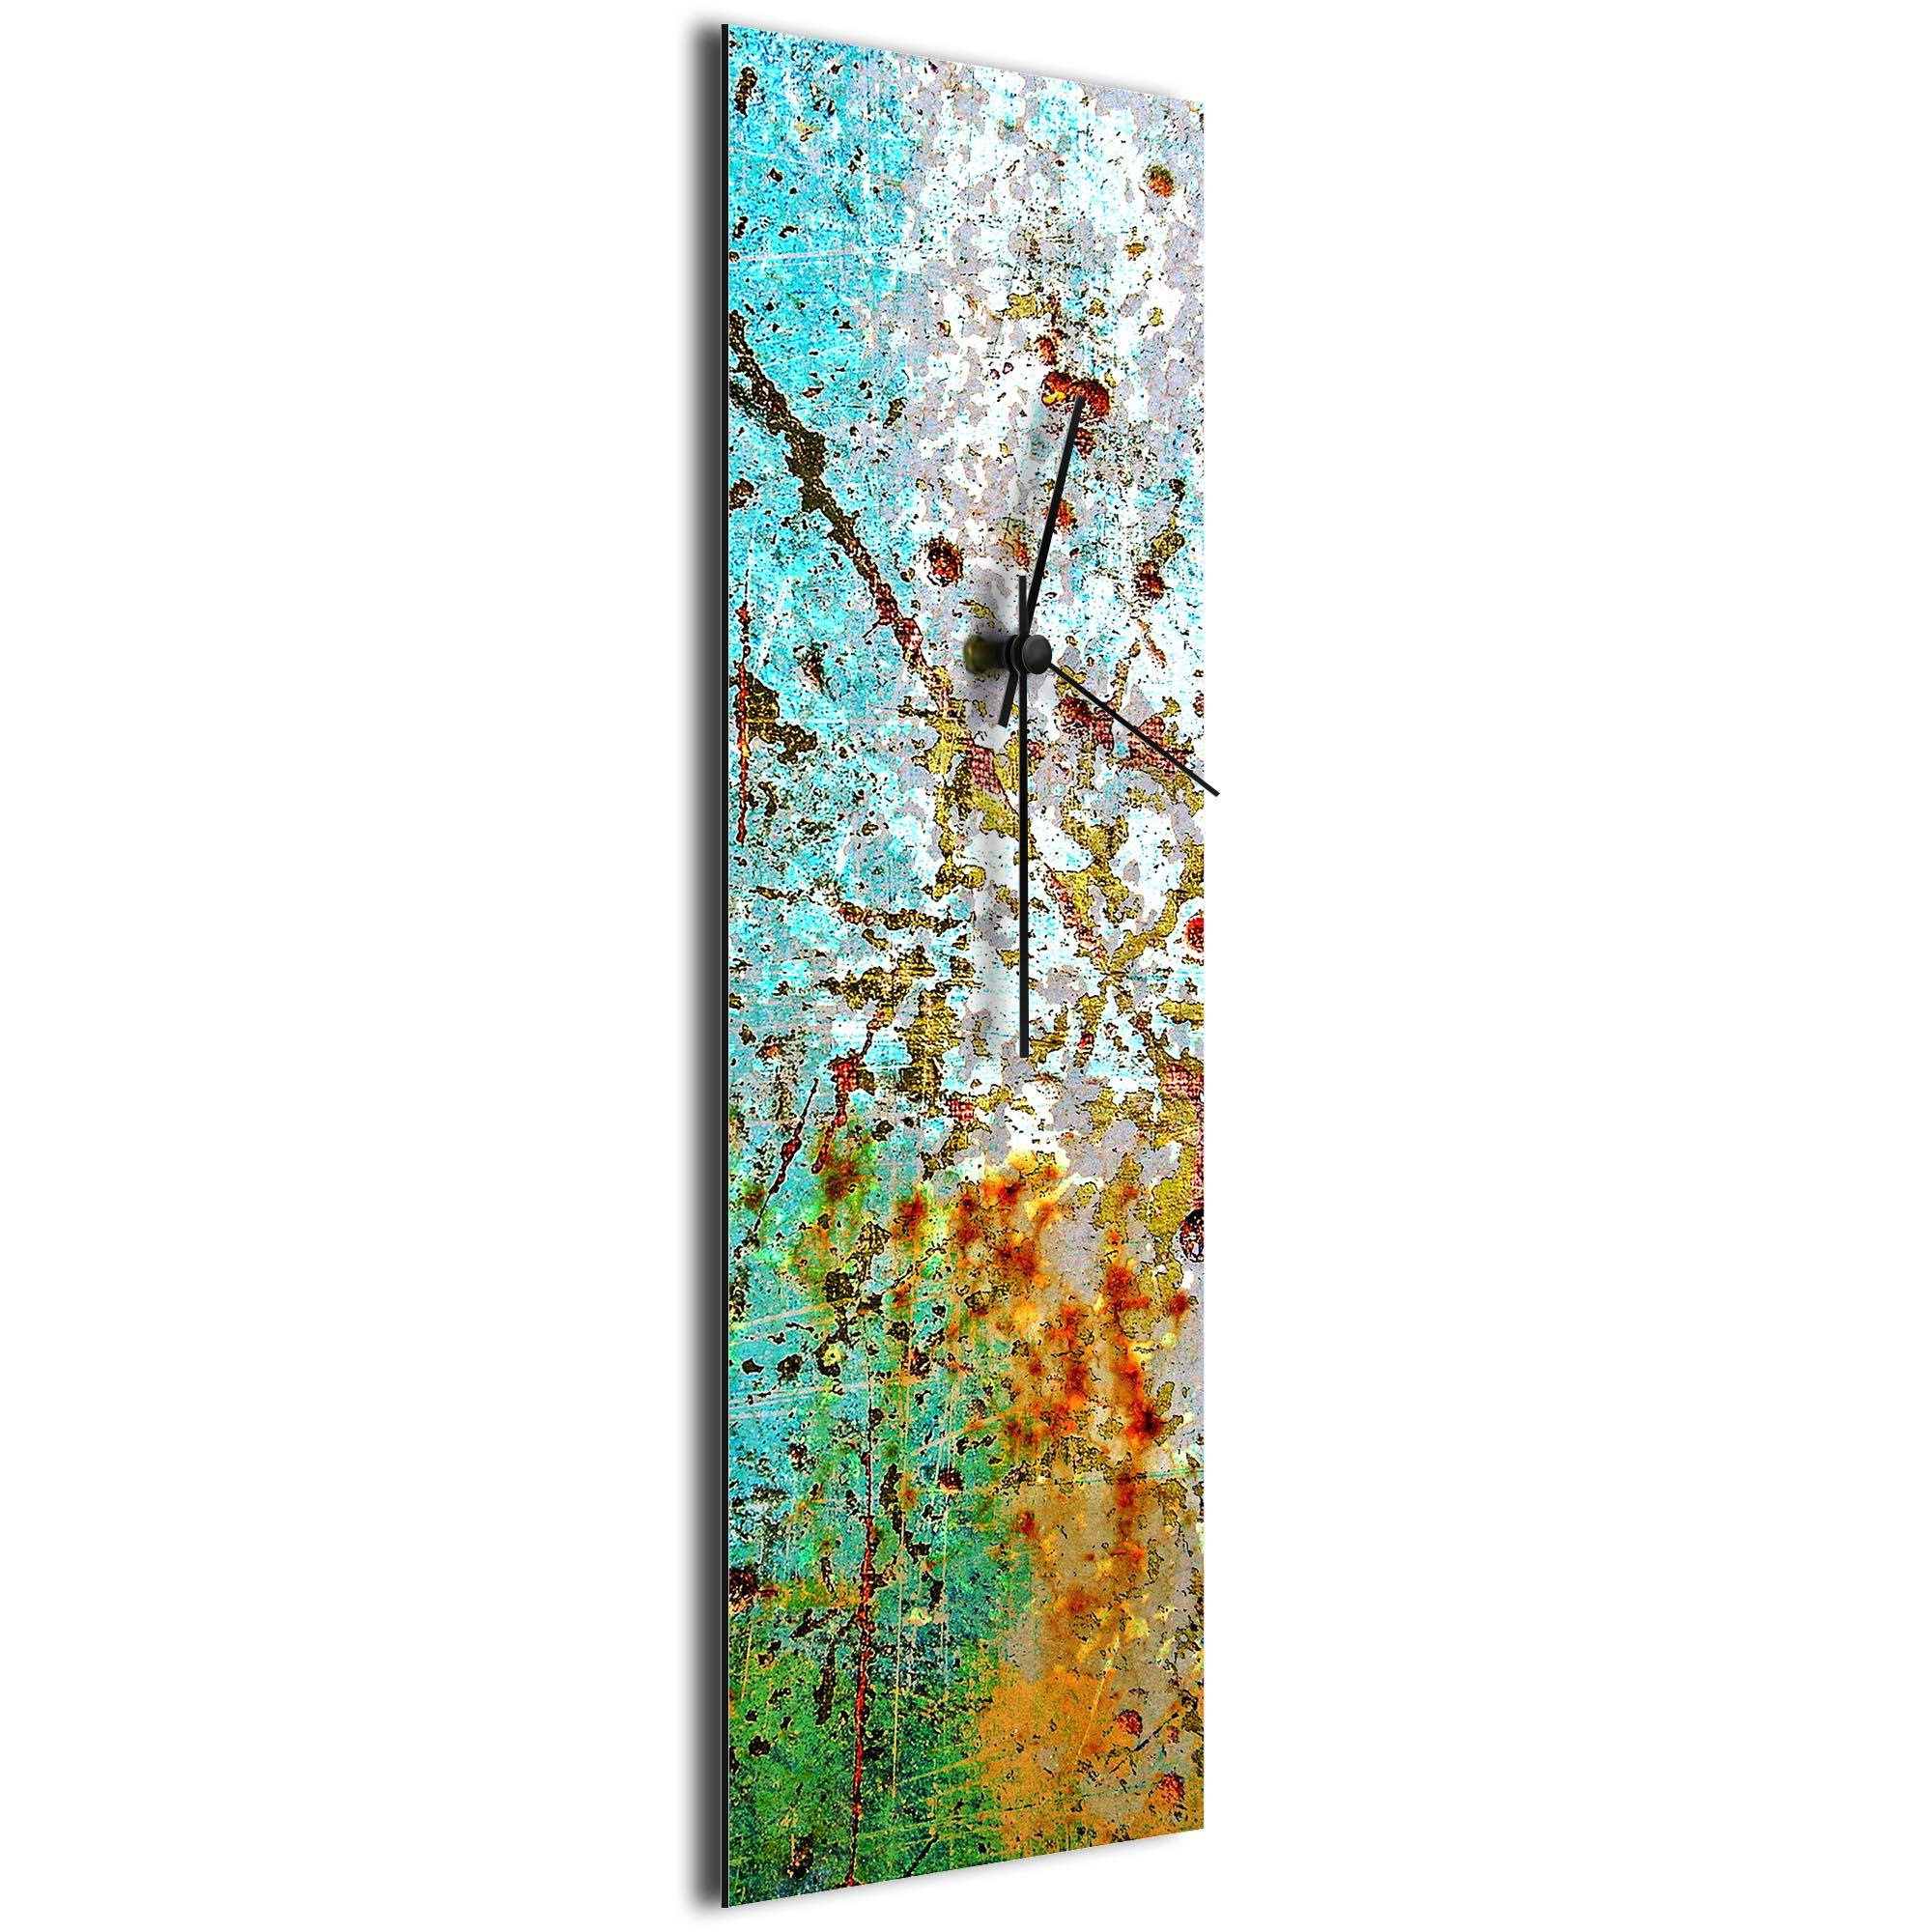 Sentinal Clock v2 by NAY - Distressed Modern Wall Clock - Image 2